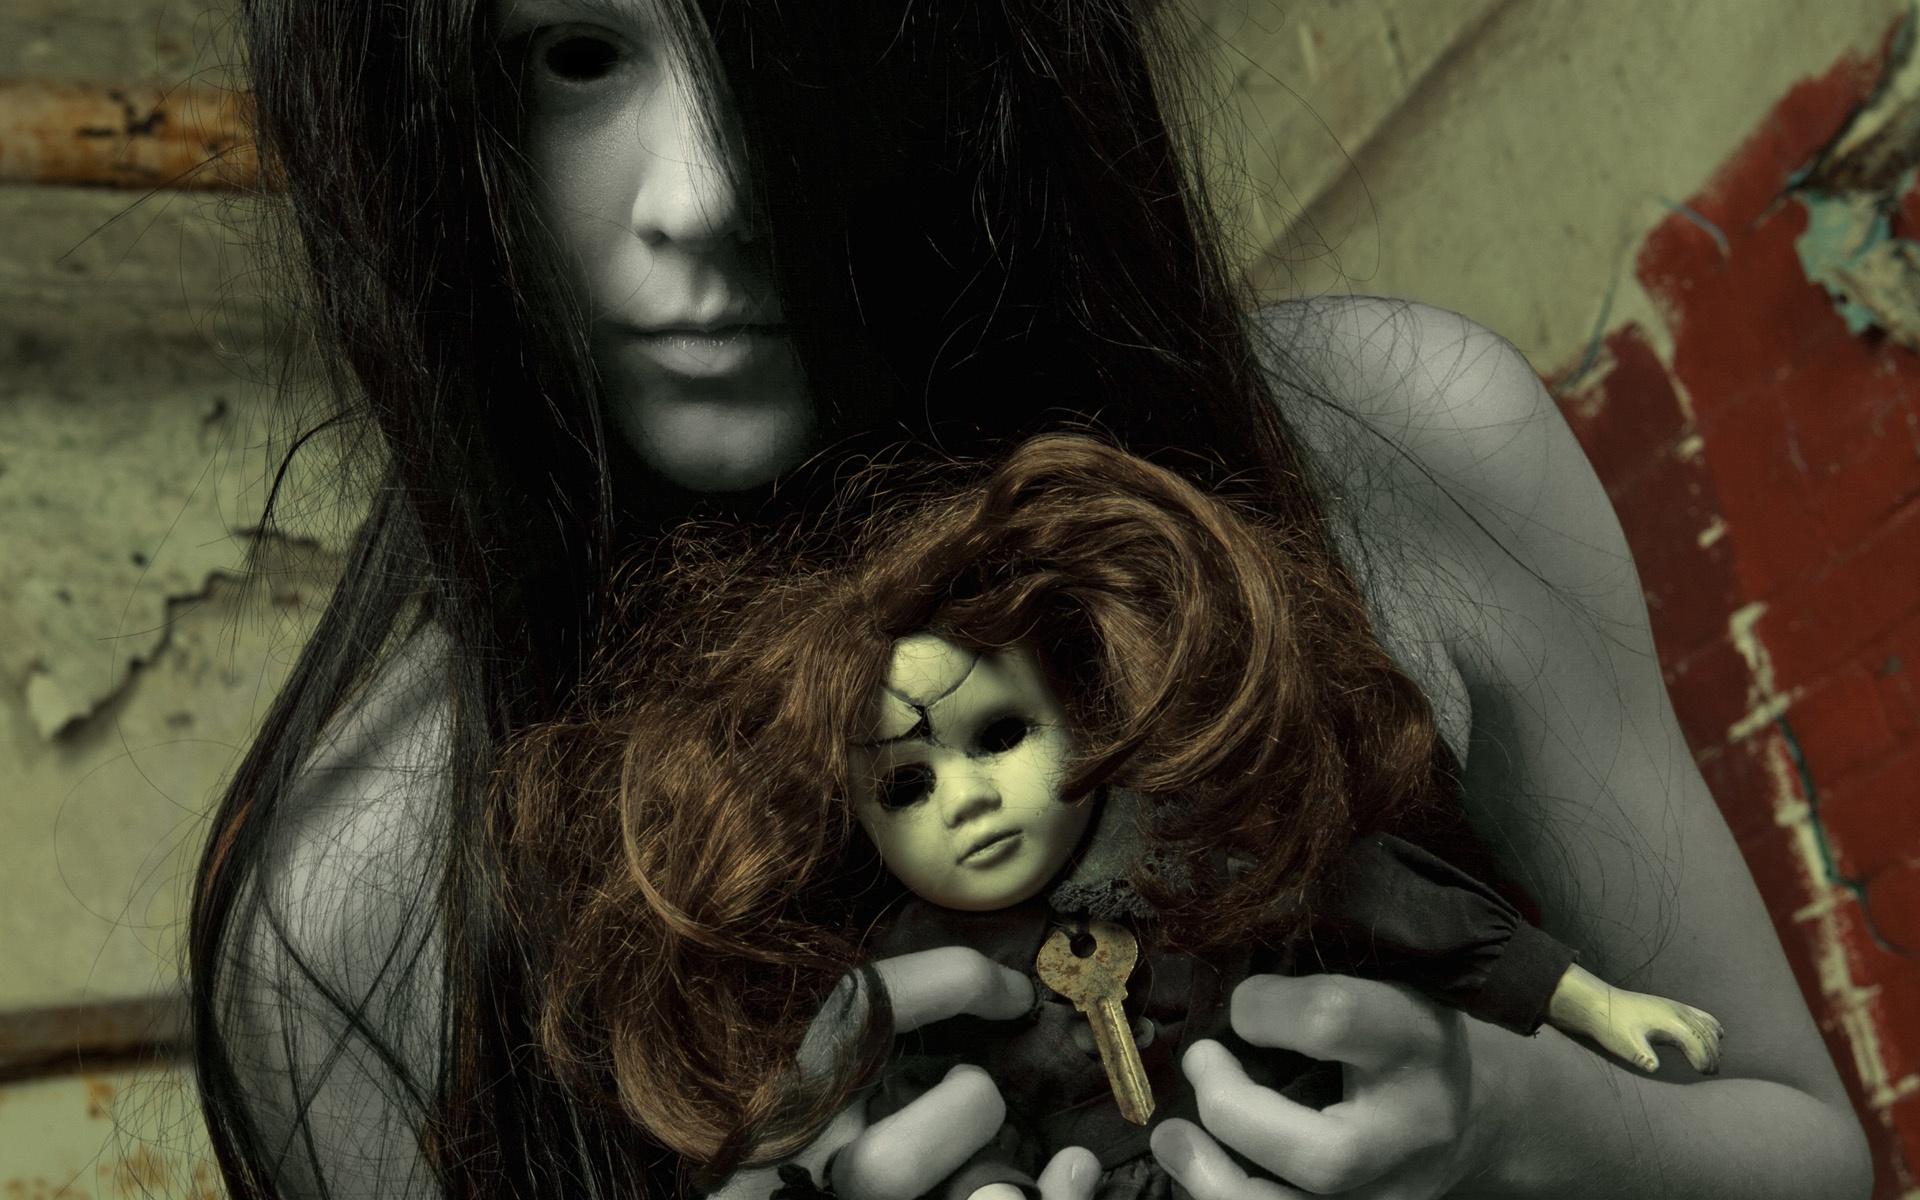 Creepy ghost girl naked hentia tubes